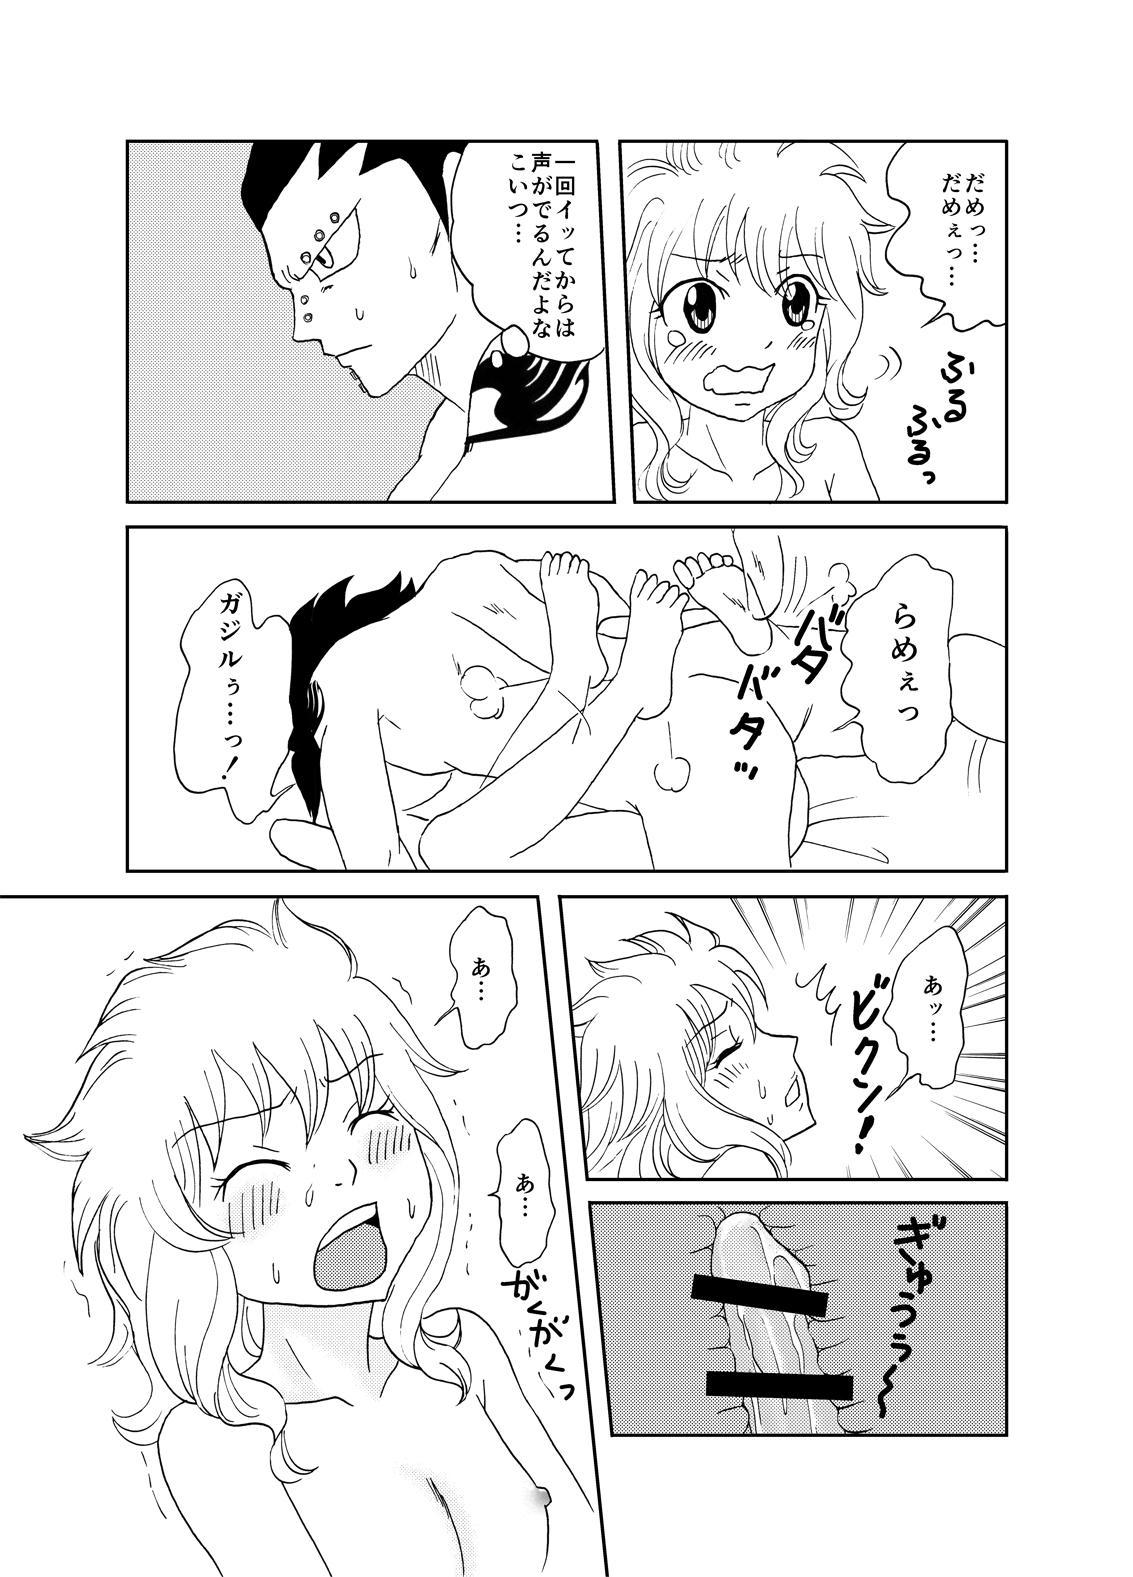 [Cashew] GajeeLevy Manga - Levy-chan ni Gohoushi (Fairy Tail) 15